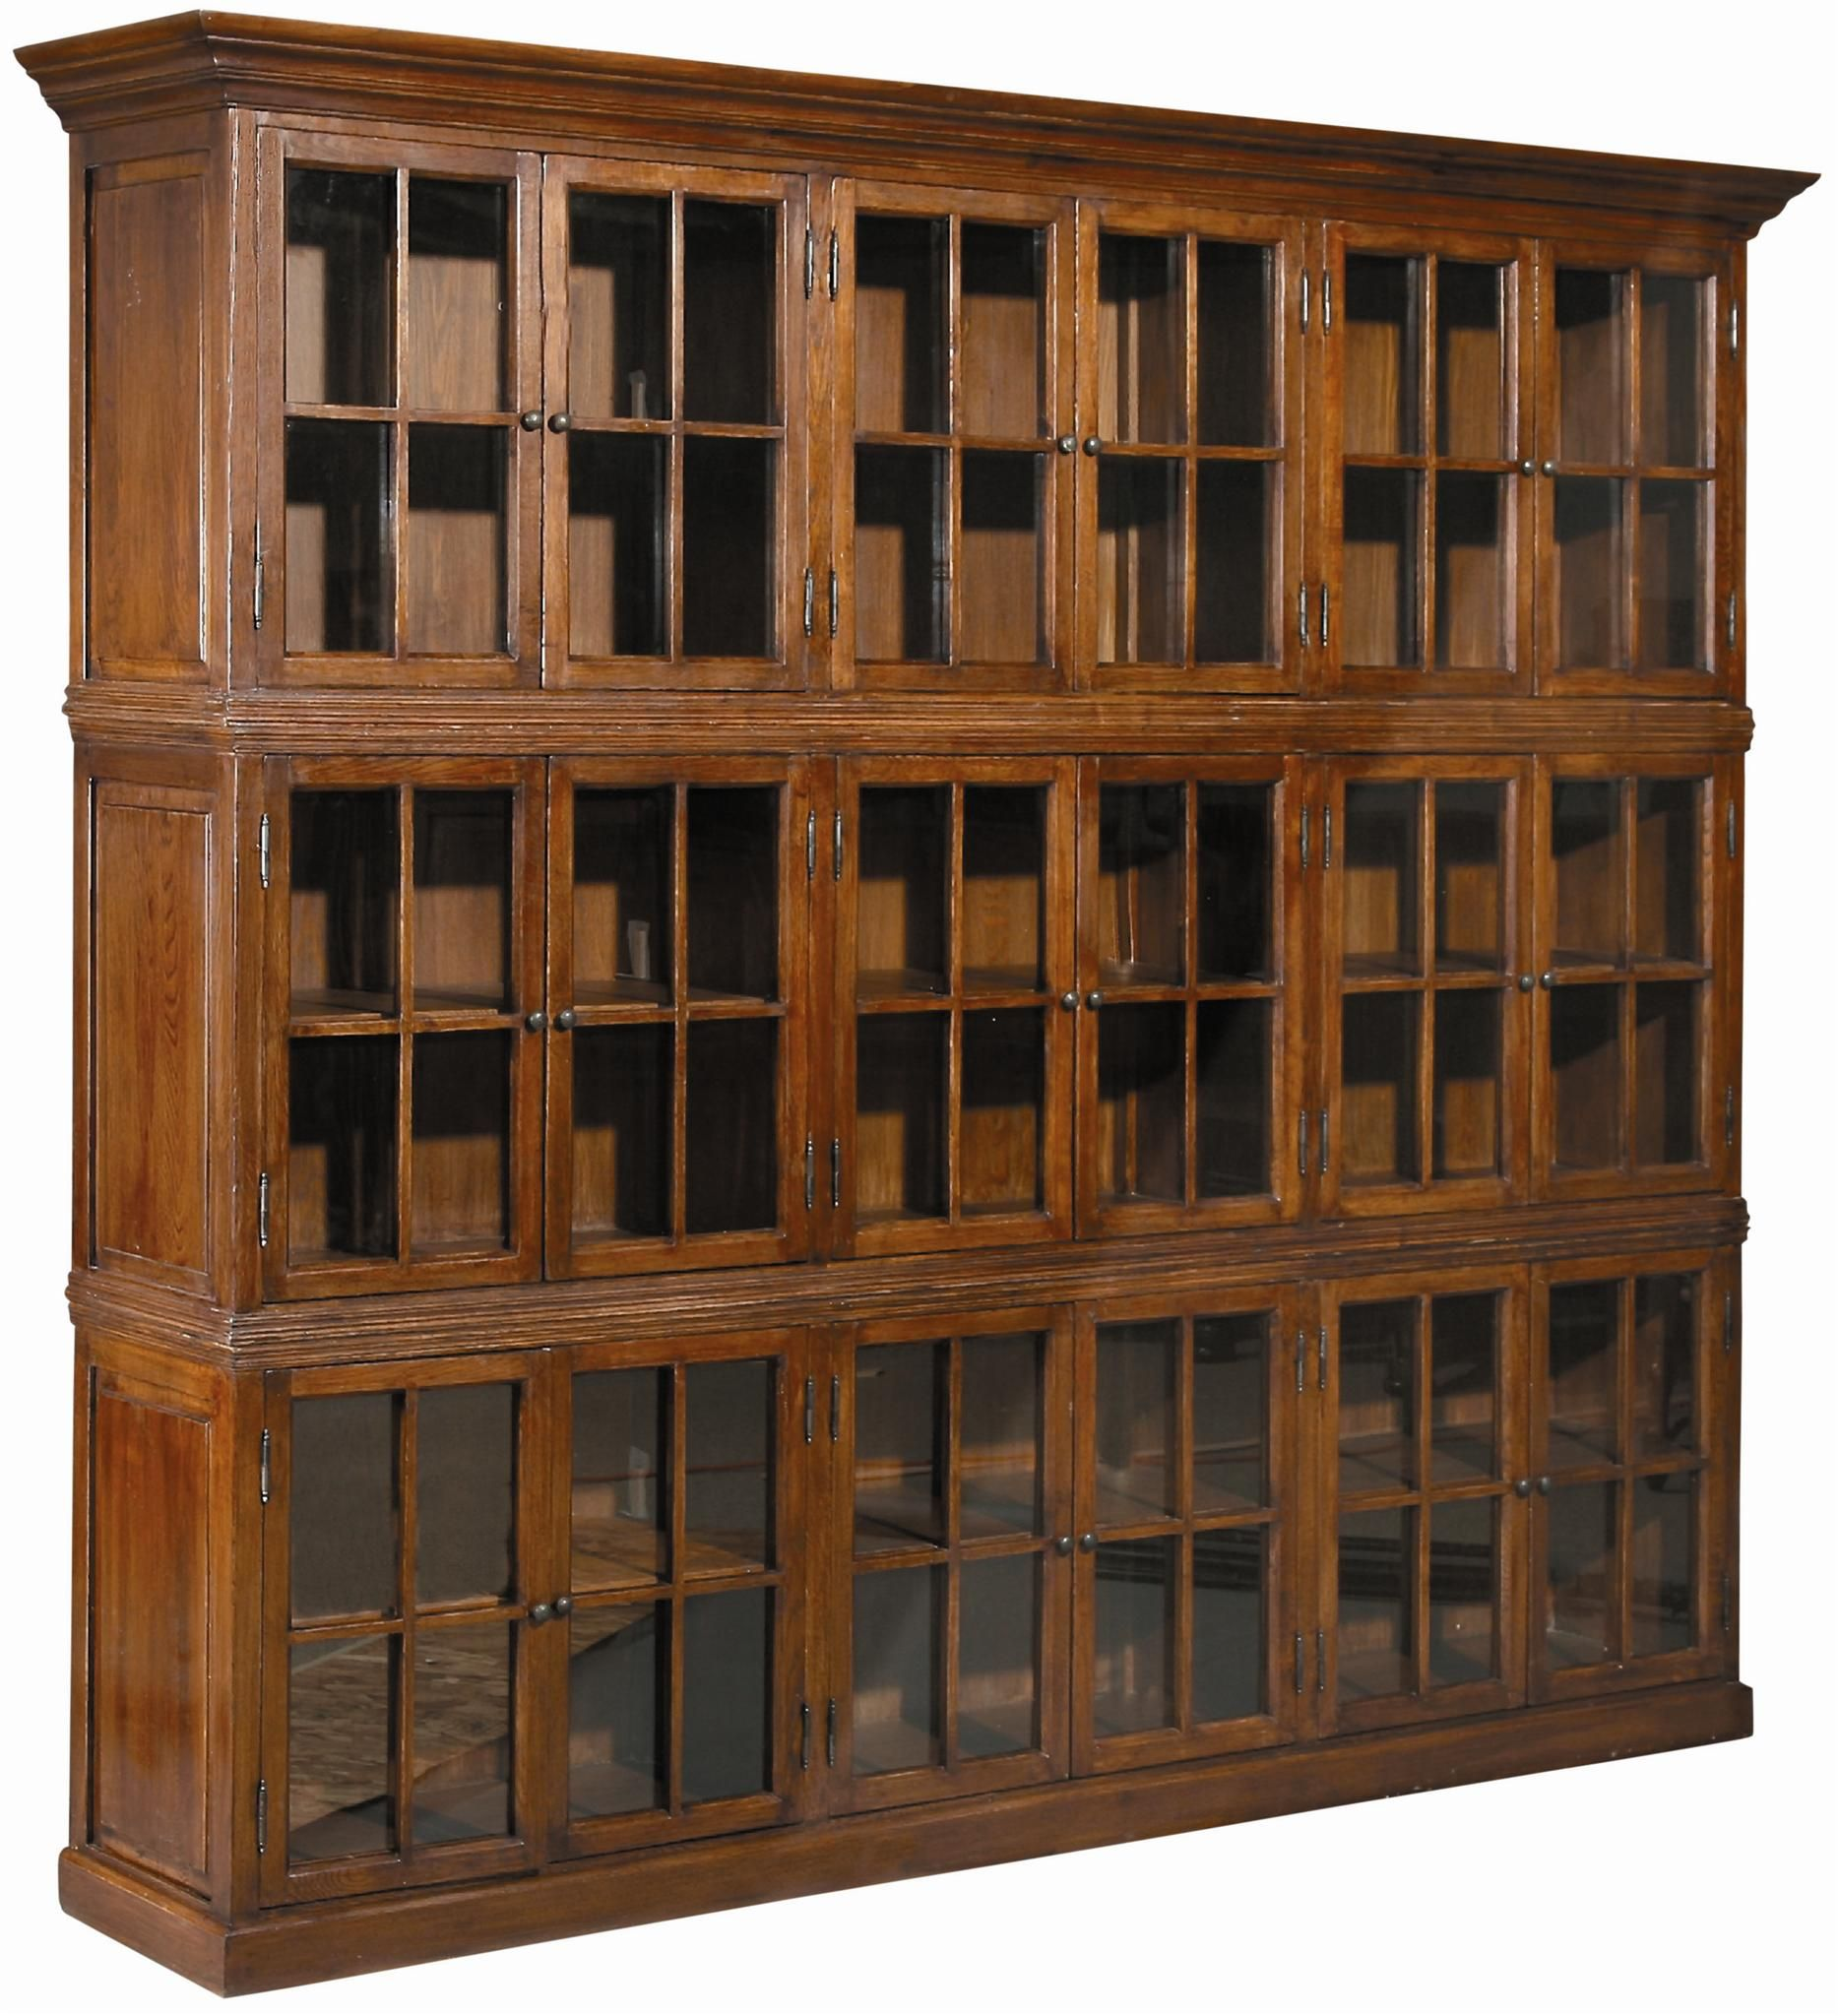 great for a dr wohnen pinterest vintage m bel m bel und schrank. Black Bedroom Furniture Sets. Home Design Ideas